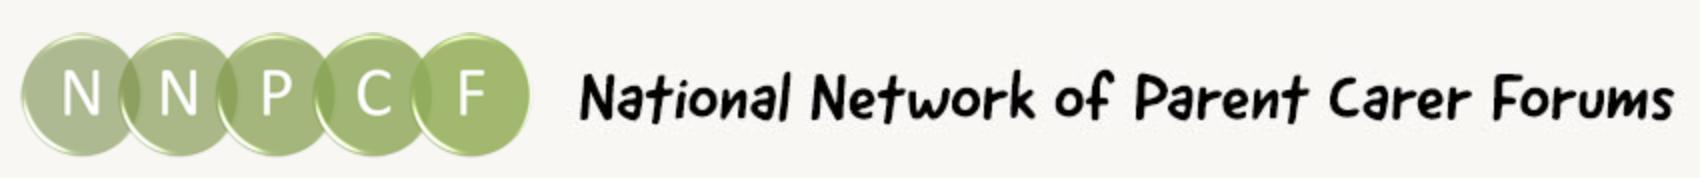 NNPCF News